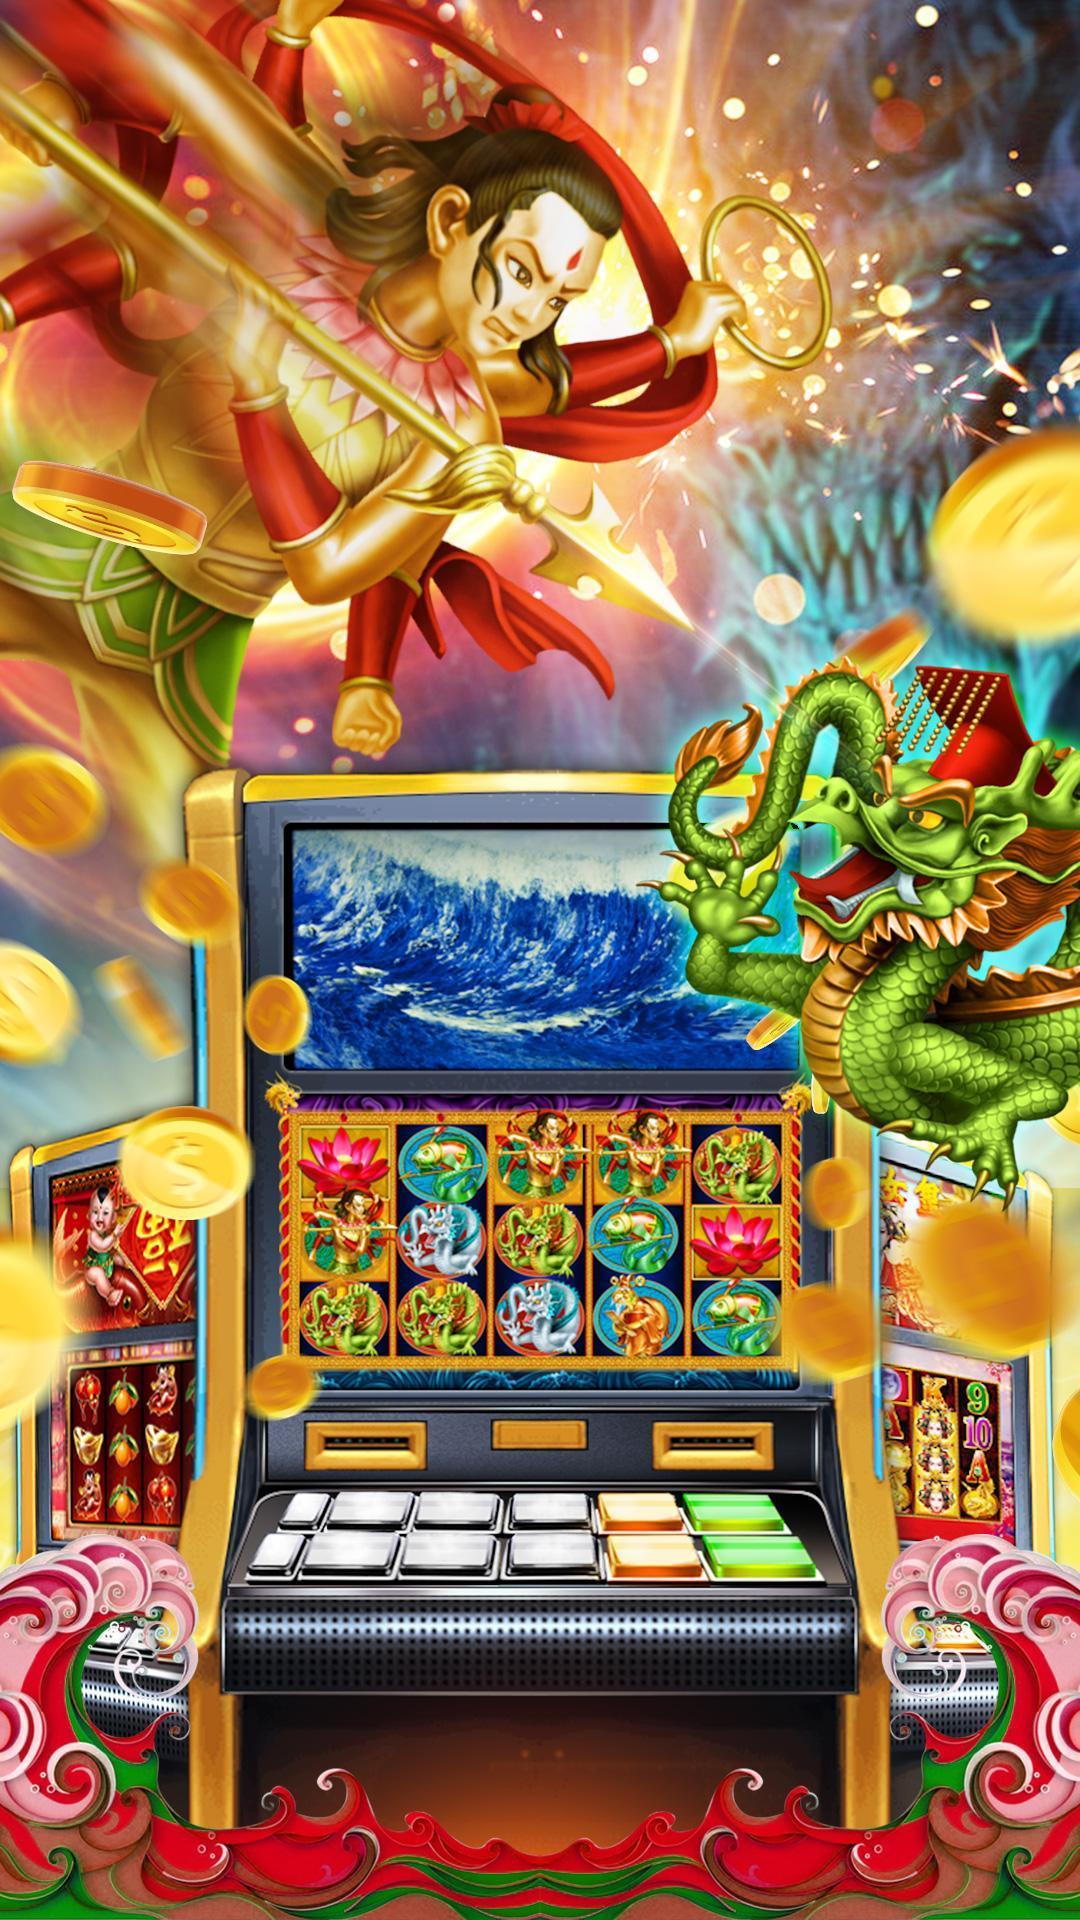 Big win casino 120 free spins